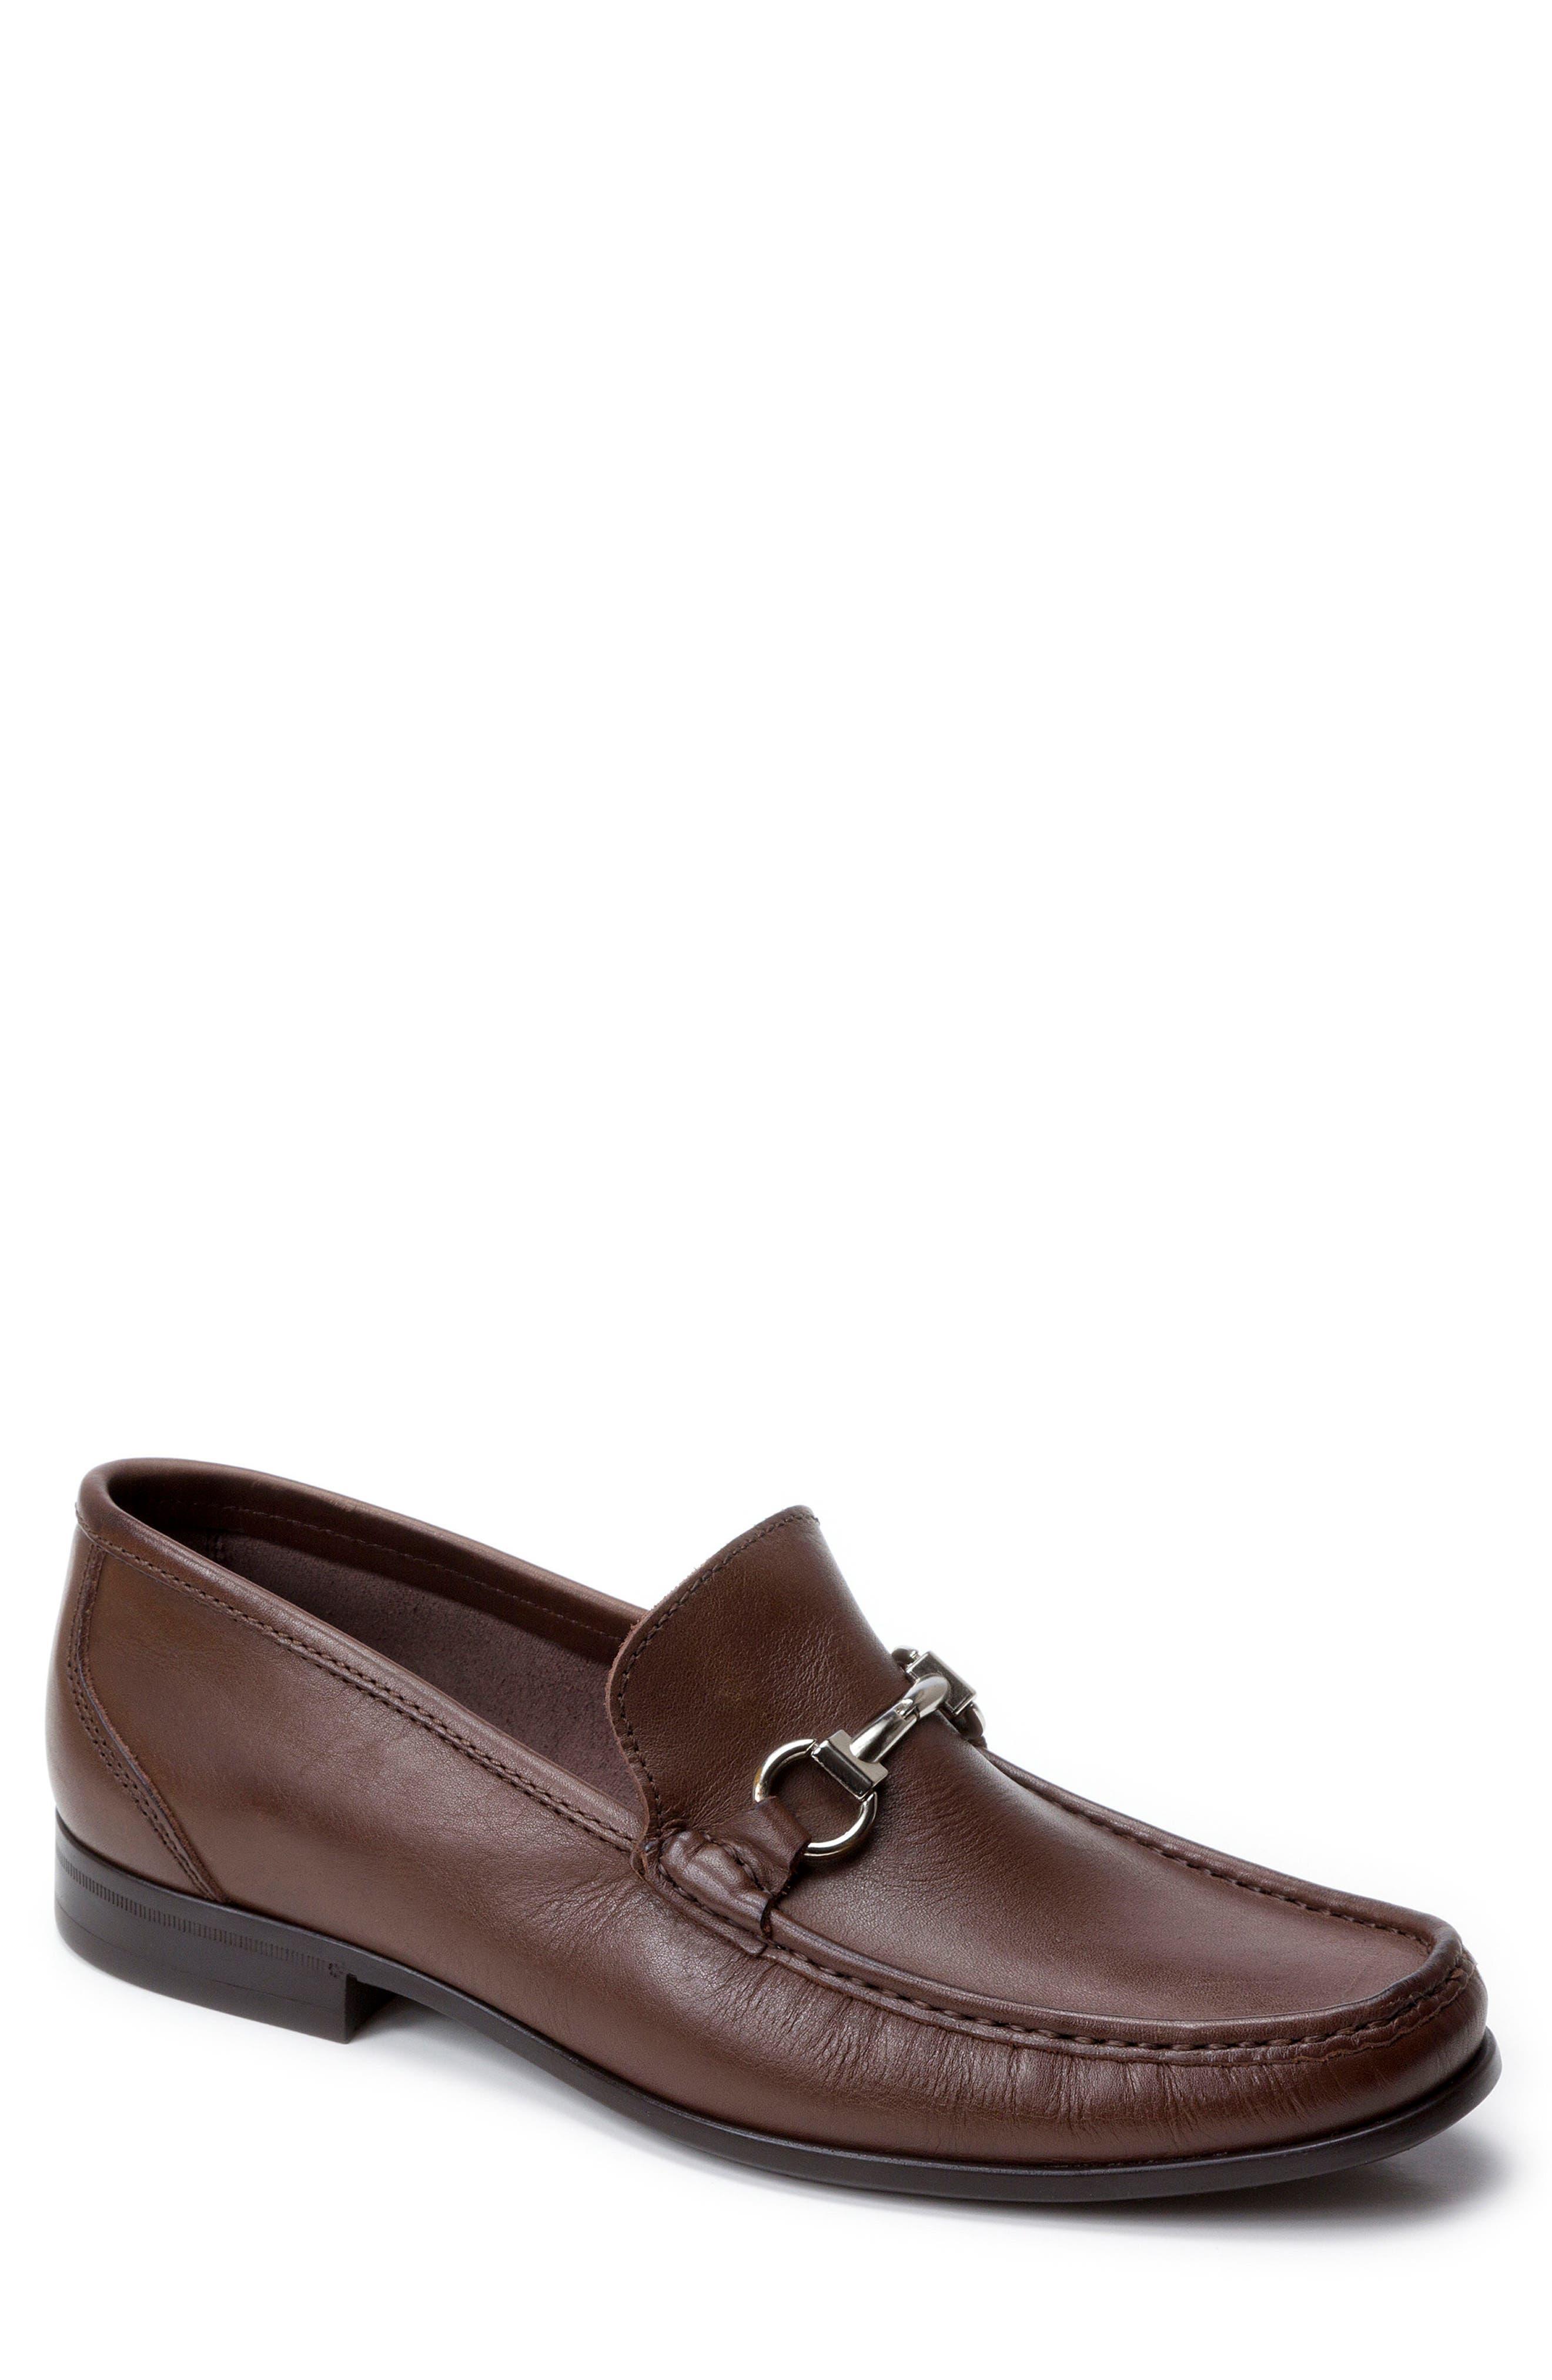 'Malibu' Suede Bit Loafer,                         Main,                         color, Brown Leather